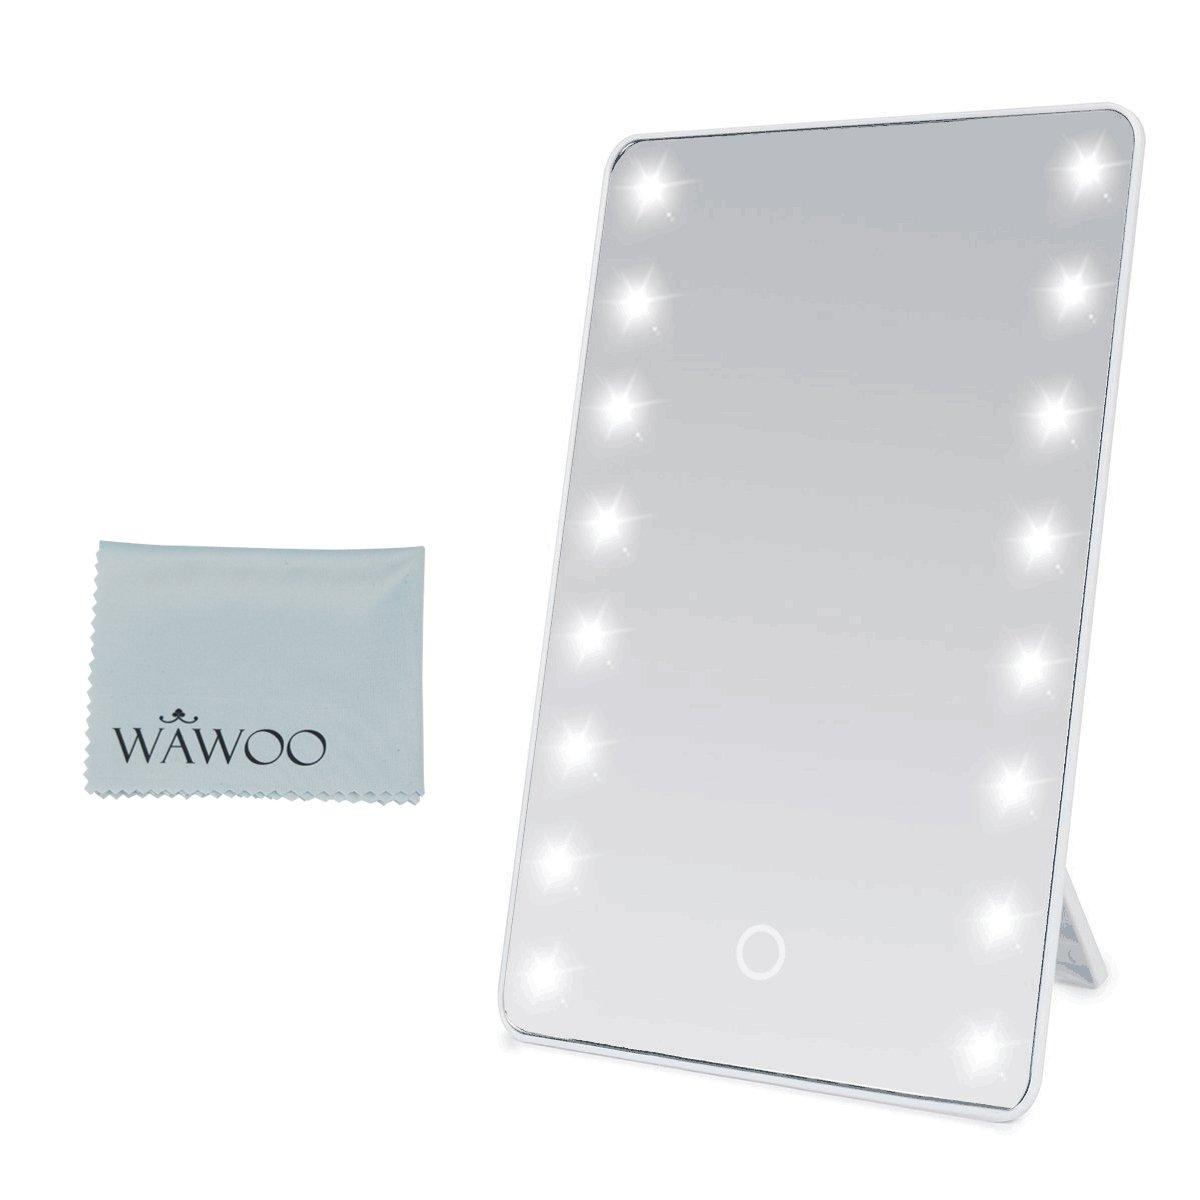 Wawoo® Make-up-Spiegel mit LED Beleuchtung Dimmbar durch Touch ... | {Spiegel mit beleuchtung 87}